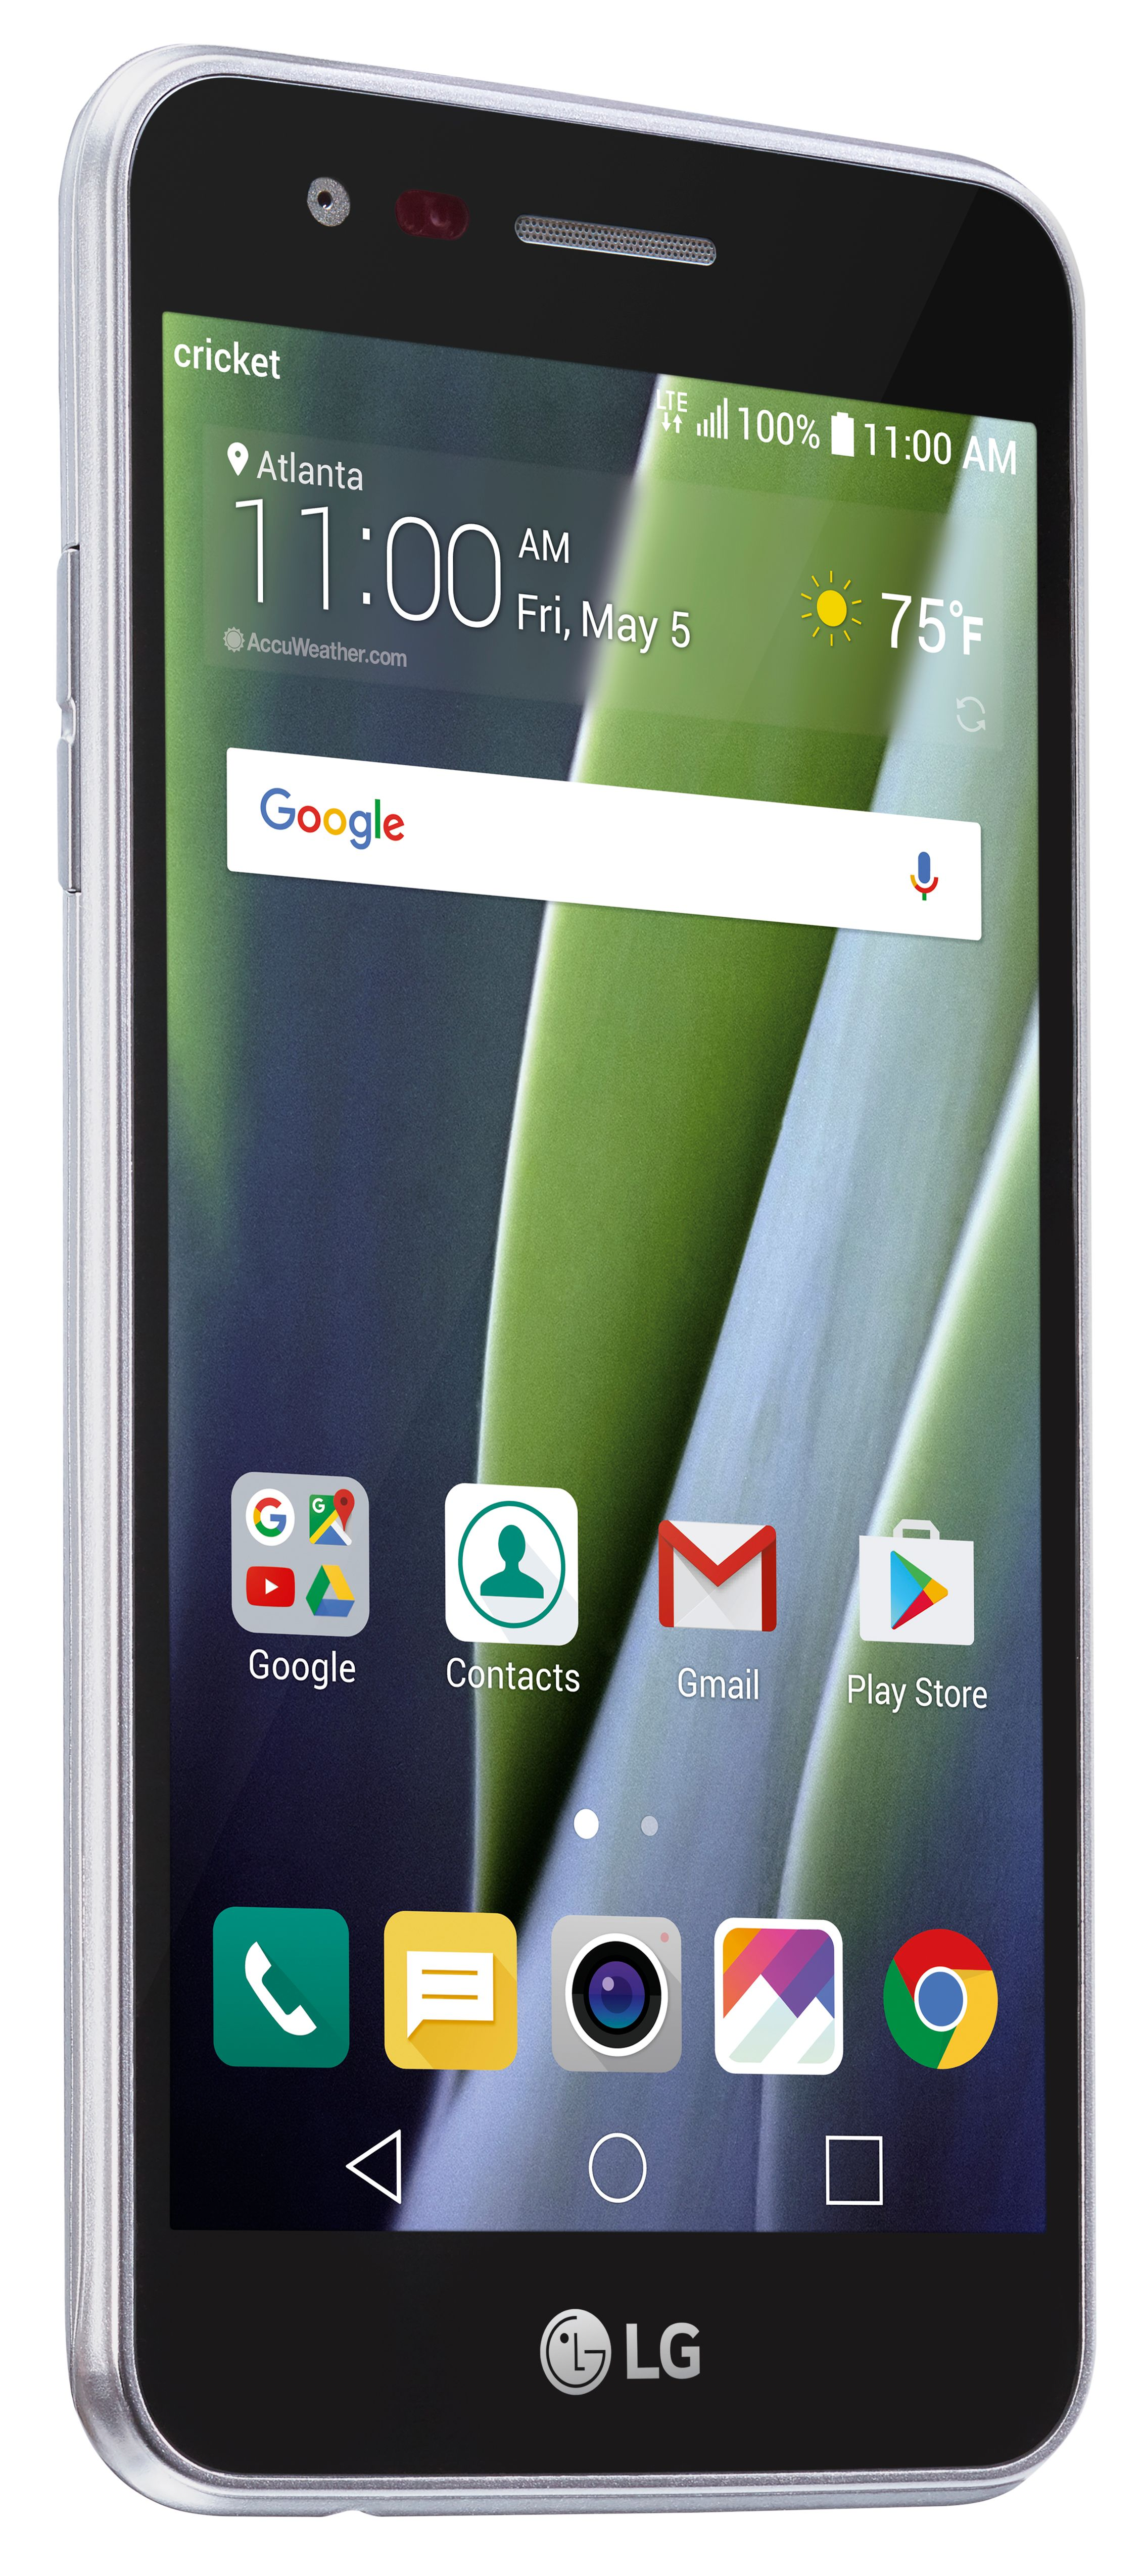 Cricket Lg Risio 2 Smartphone With Touchscreen Walmart Com